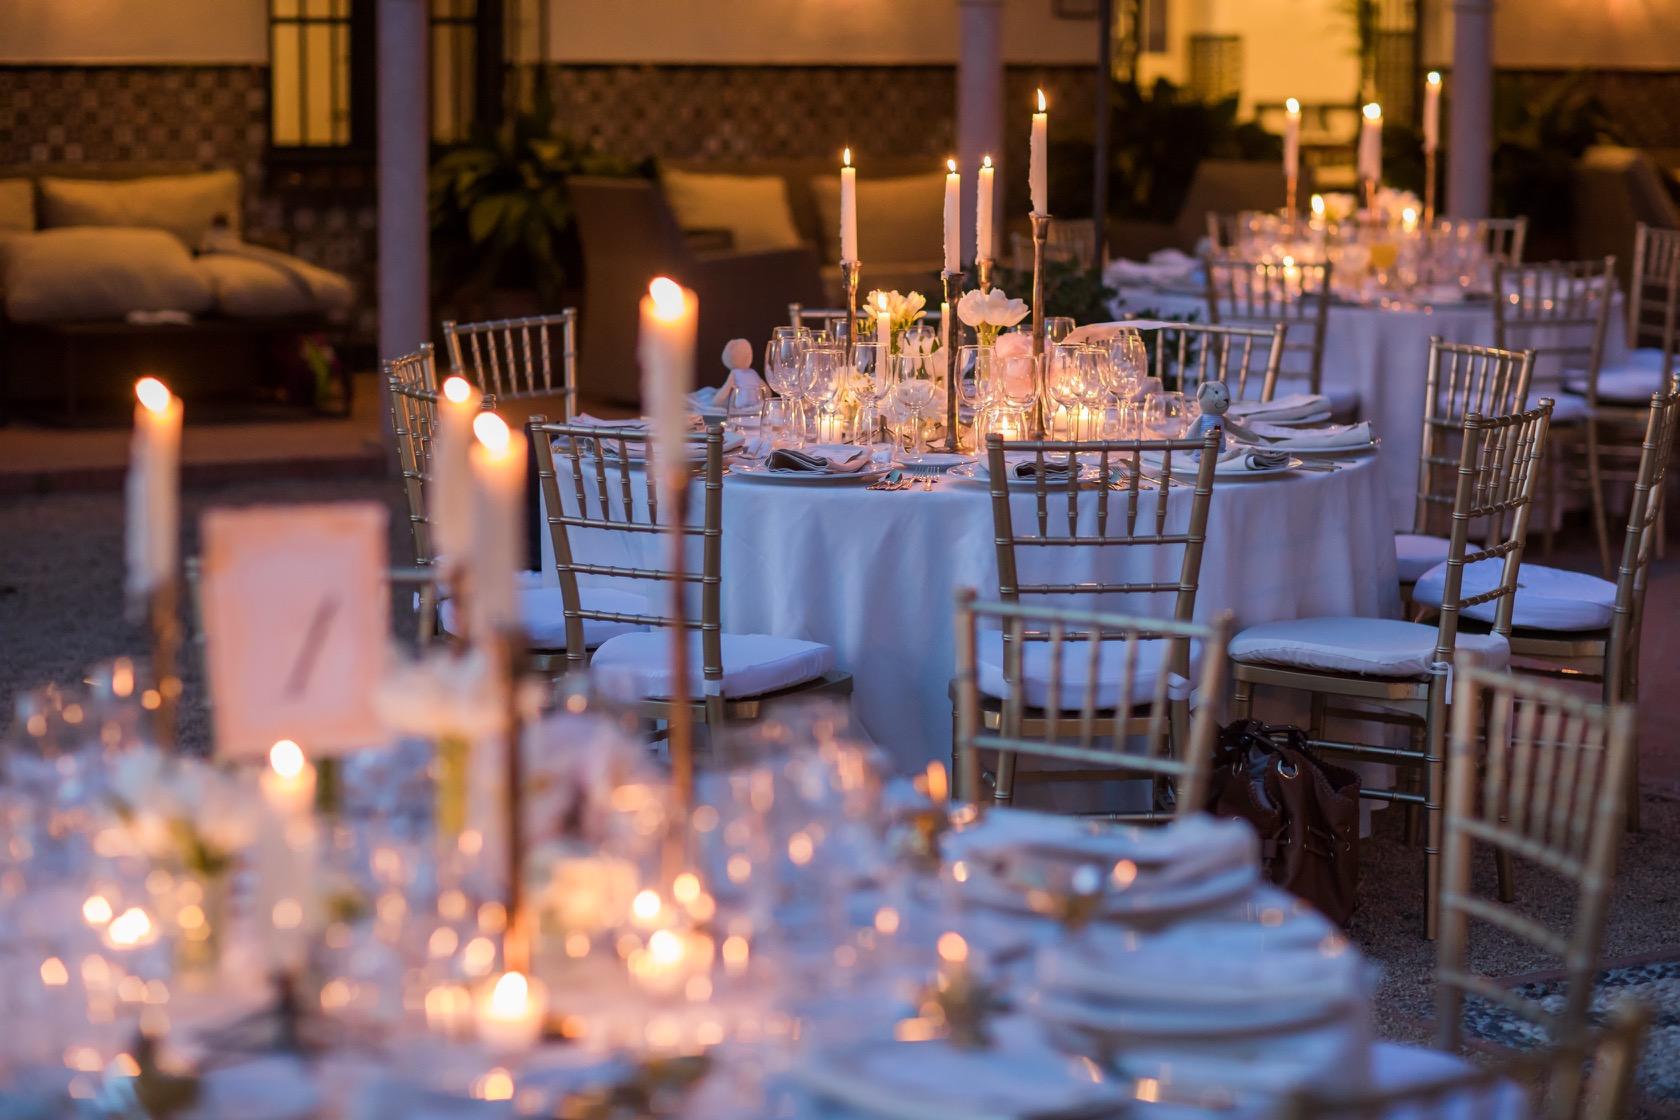 Si-Quiero-Wedding-Planner-By-Sira-Antequera-Bodas-Málaga-Marbella-Miami – Hiba-Max-2